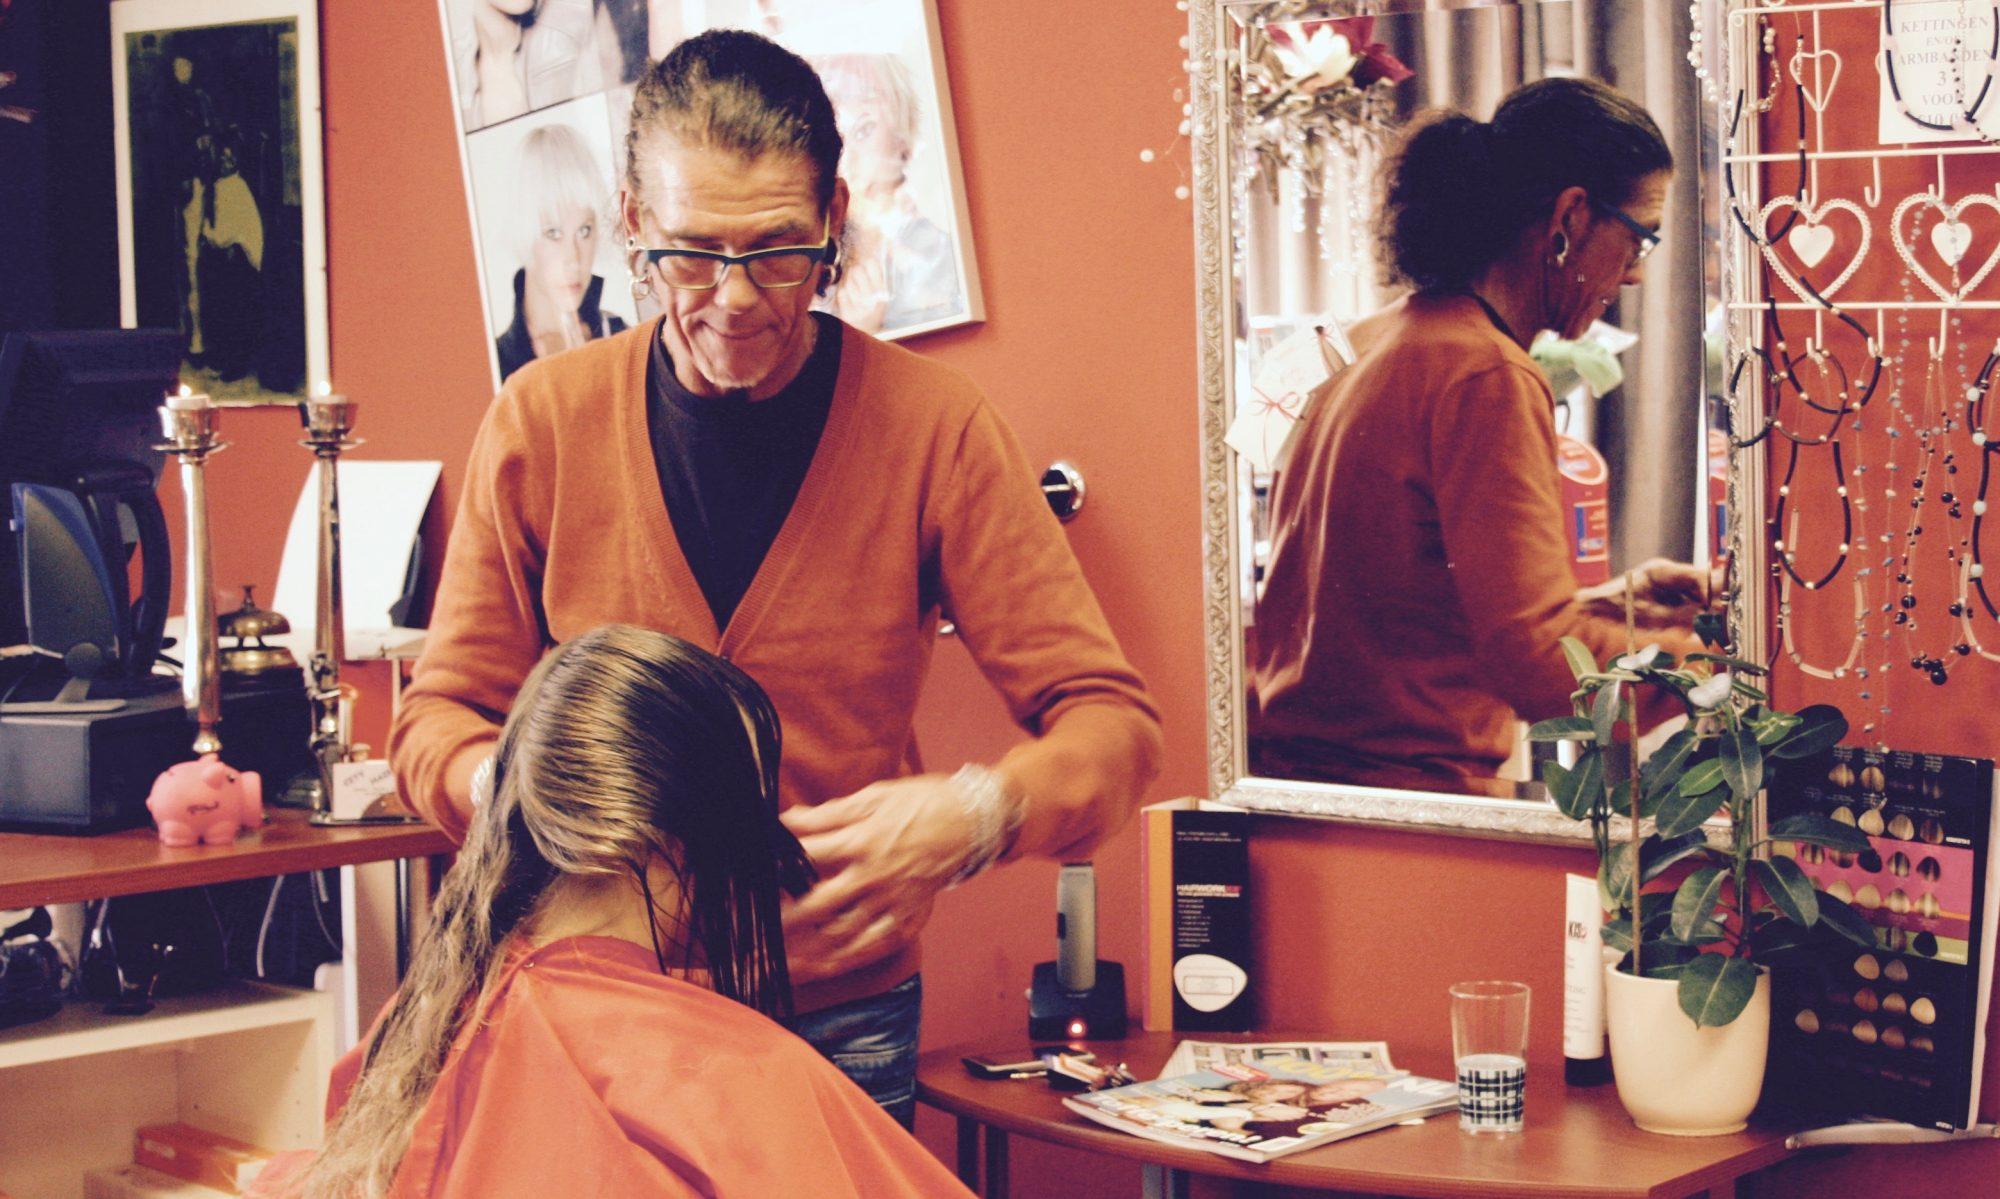 City Hairshop